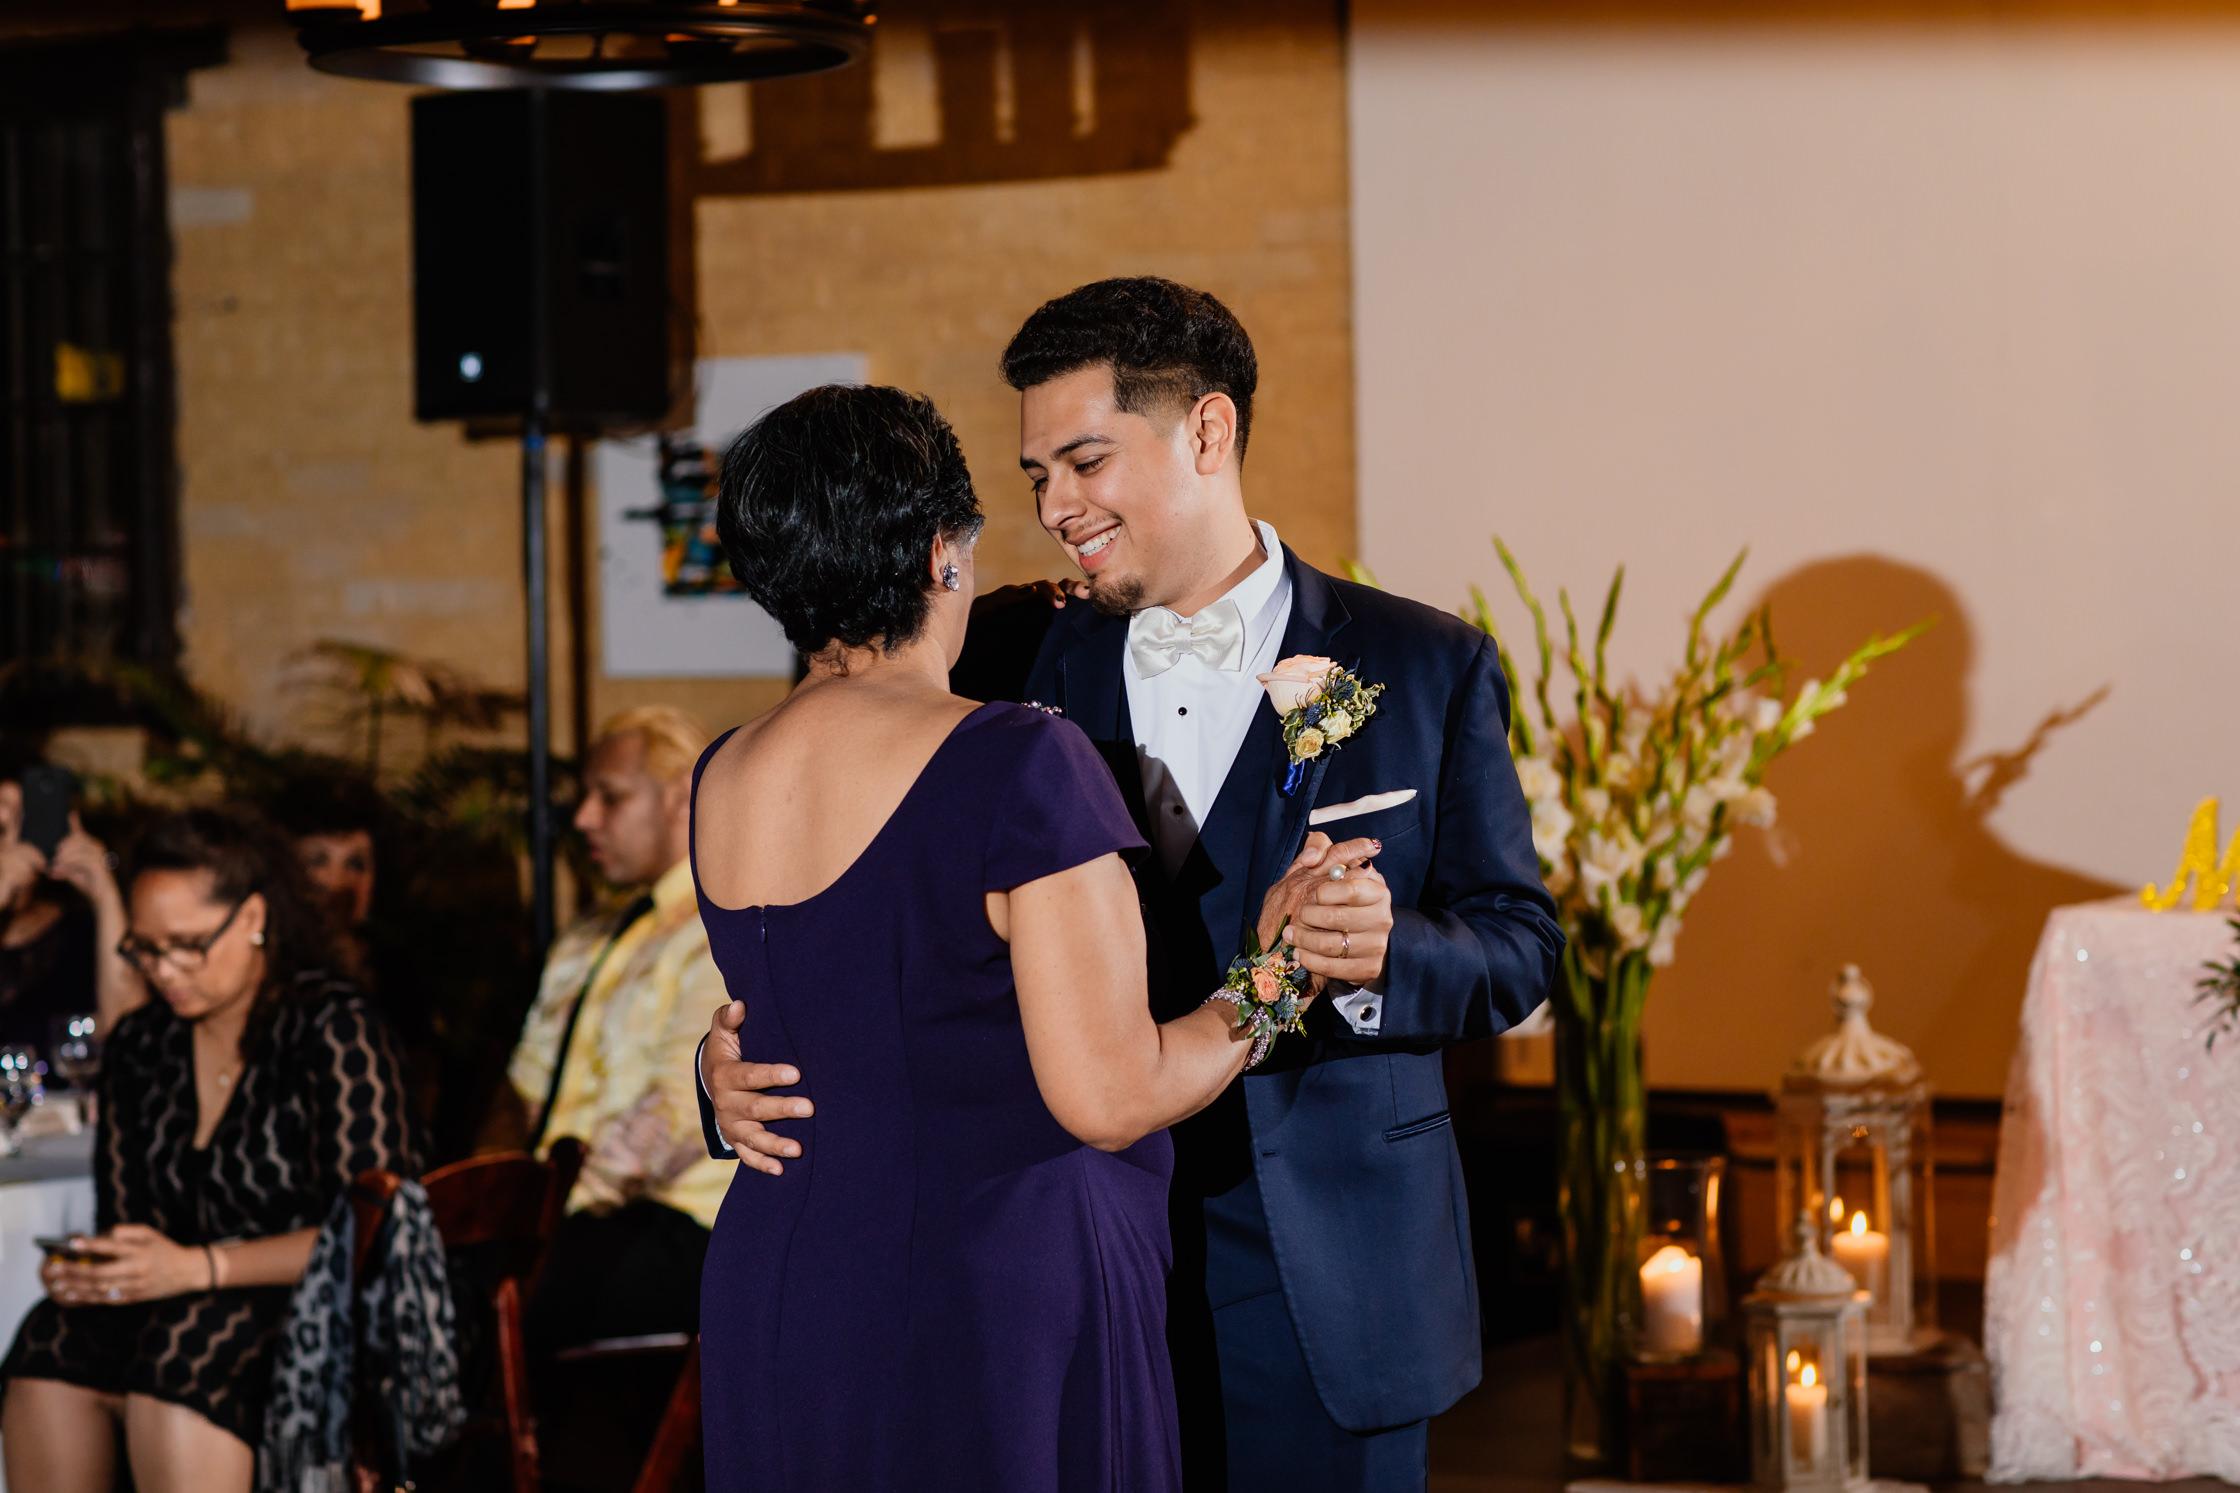 luis_joanna_wedding-96.jpg